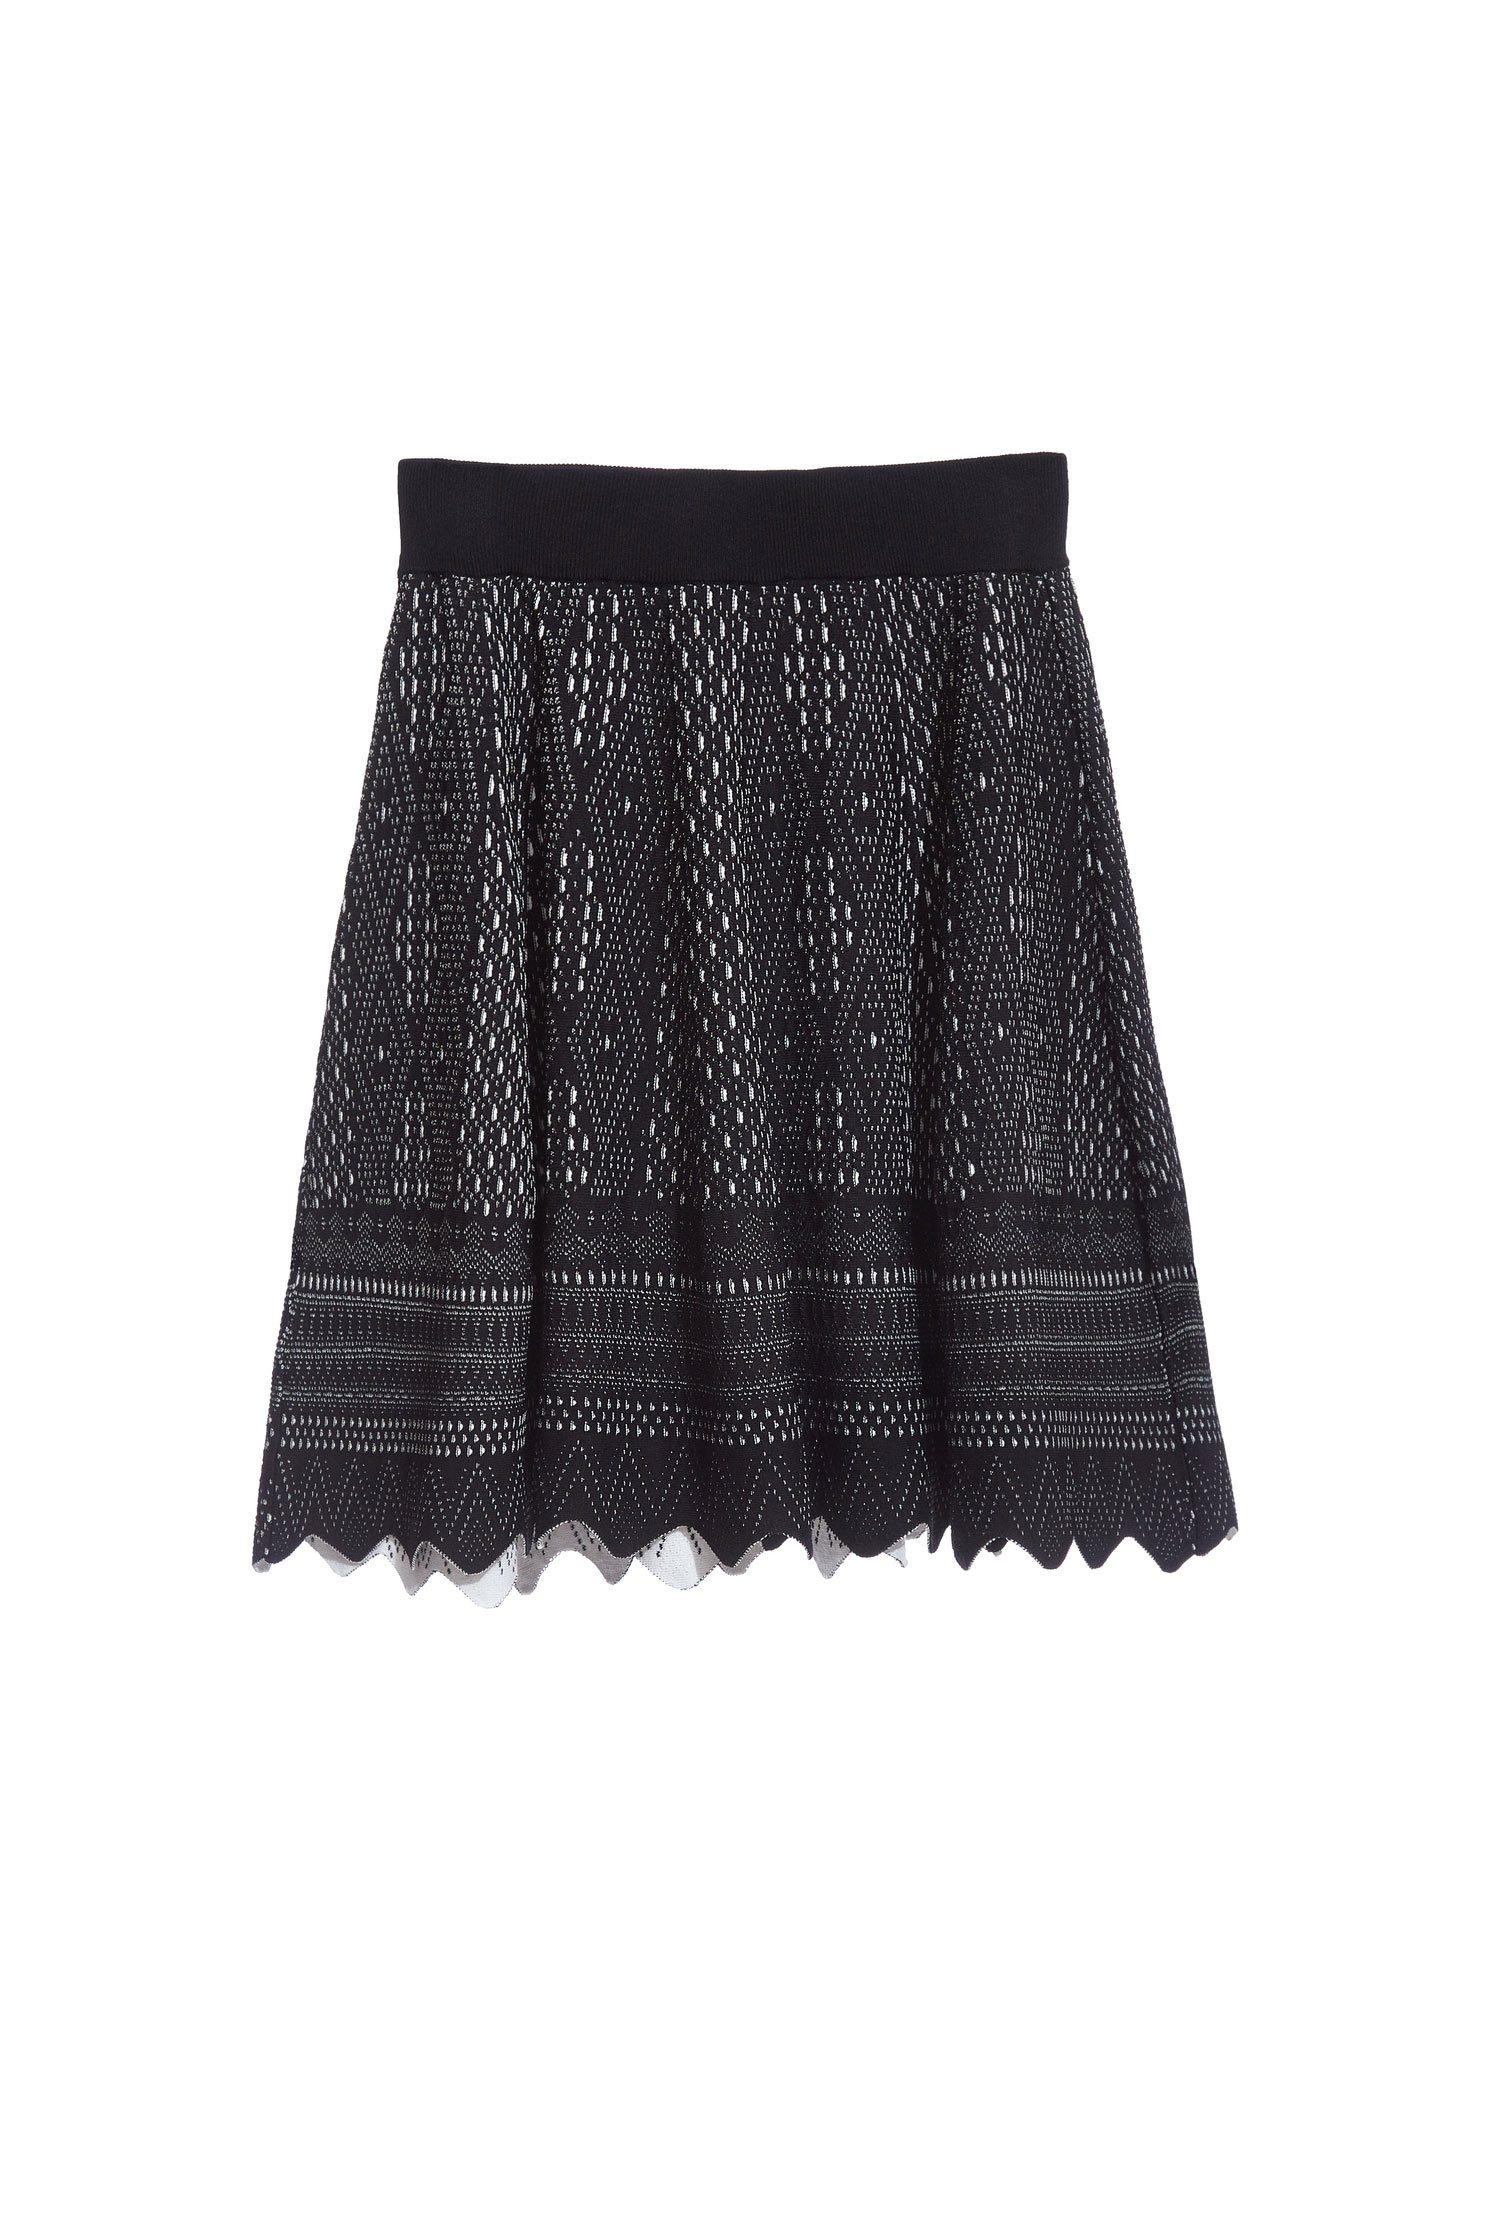 totem umbrella fashion pop skirt